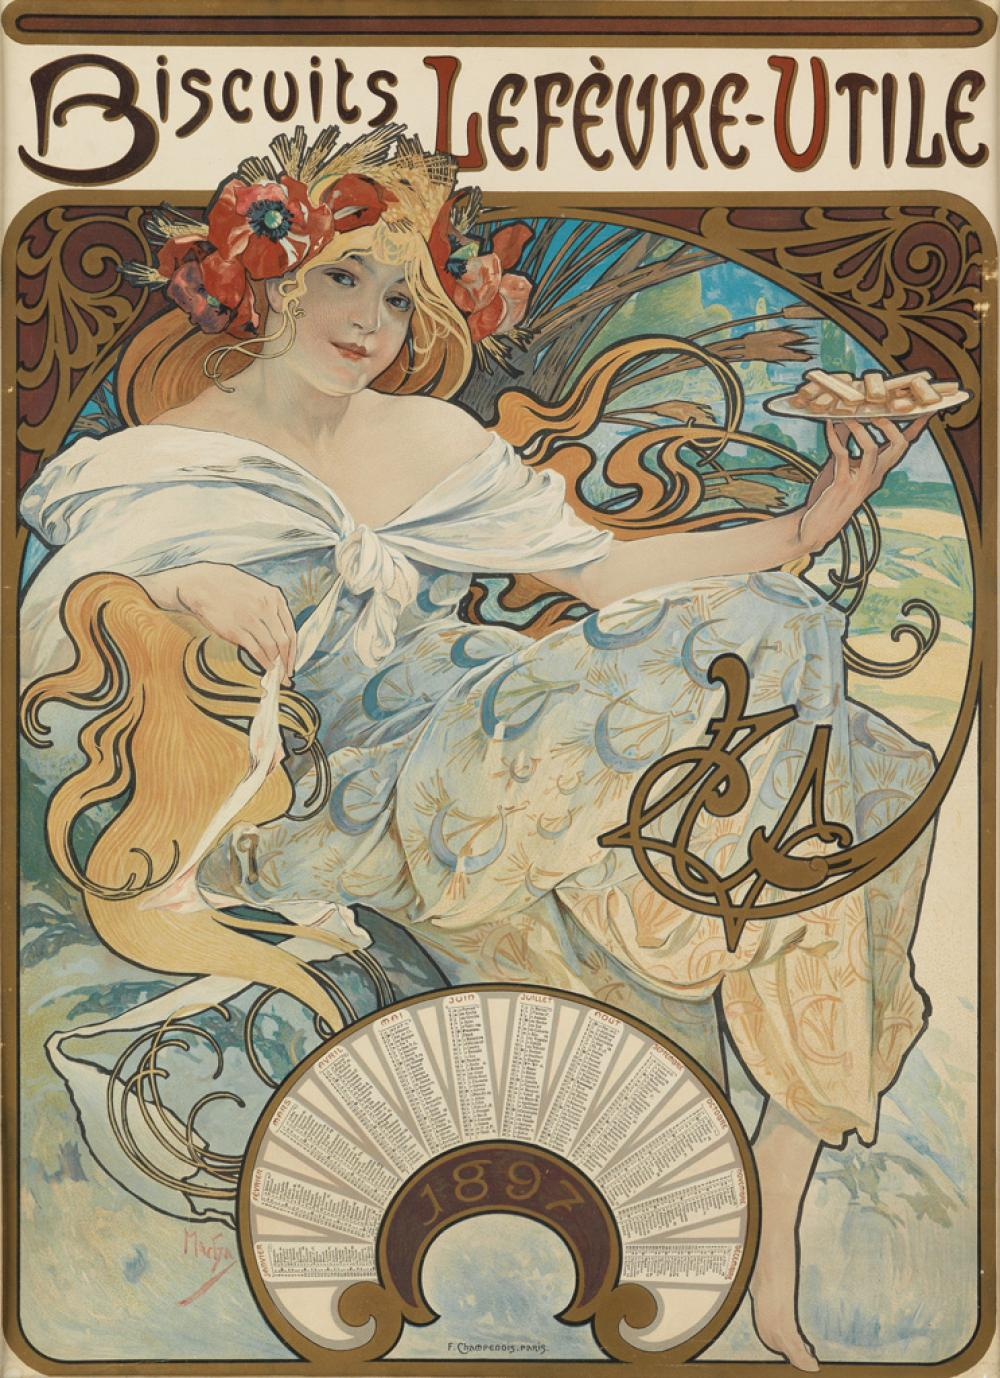 ALPHONSE MUCHA (1860-1939). BISCUITS LEFÈVRE - UTILE. 1897. 23x17 inches, 60x17 cm. F. Champenois, Paris.